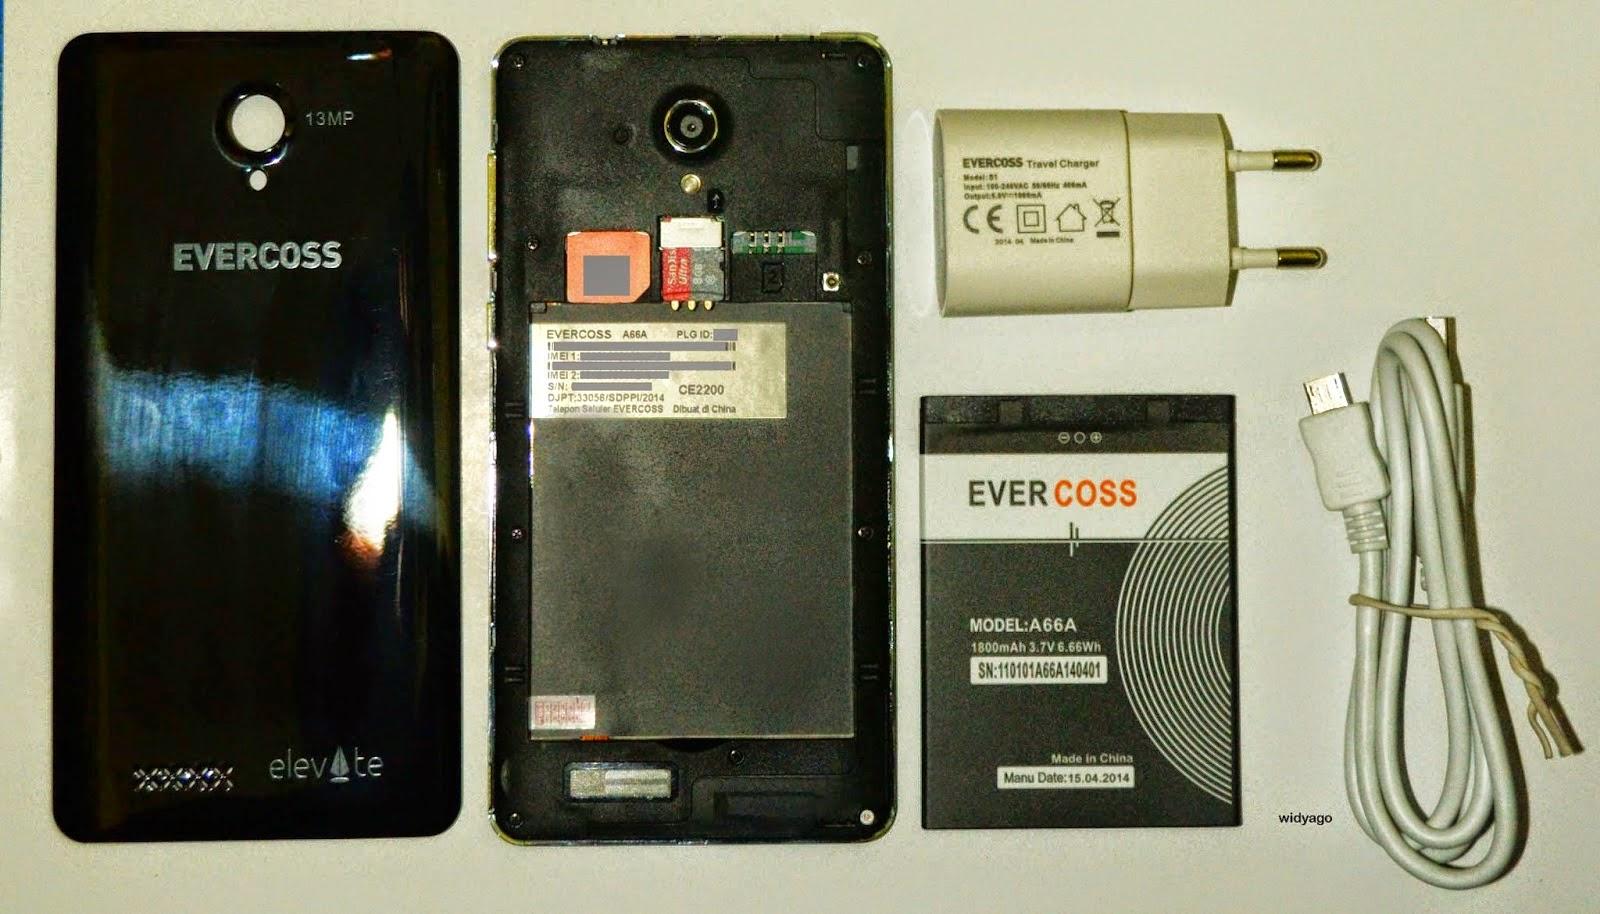 Flash Ulang Evercoss A66A Elevate Y Terbaru | Ini Cara nya!